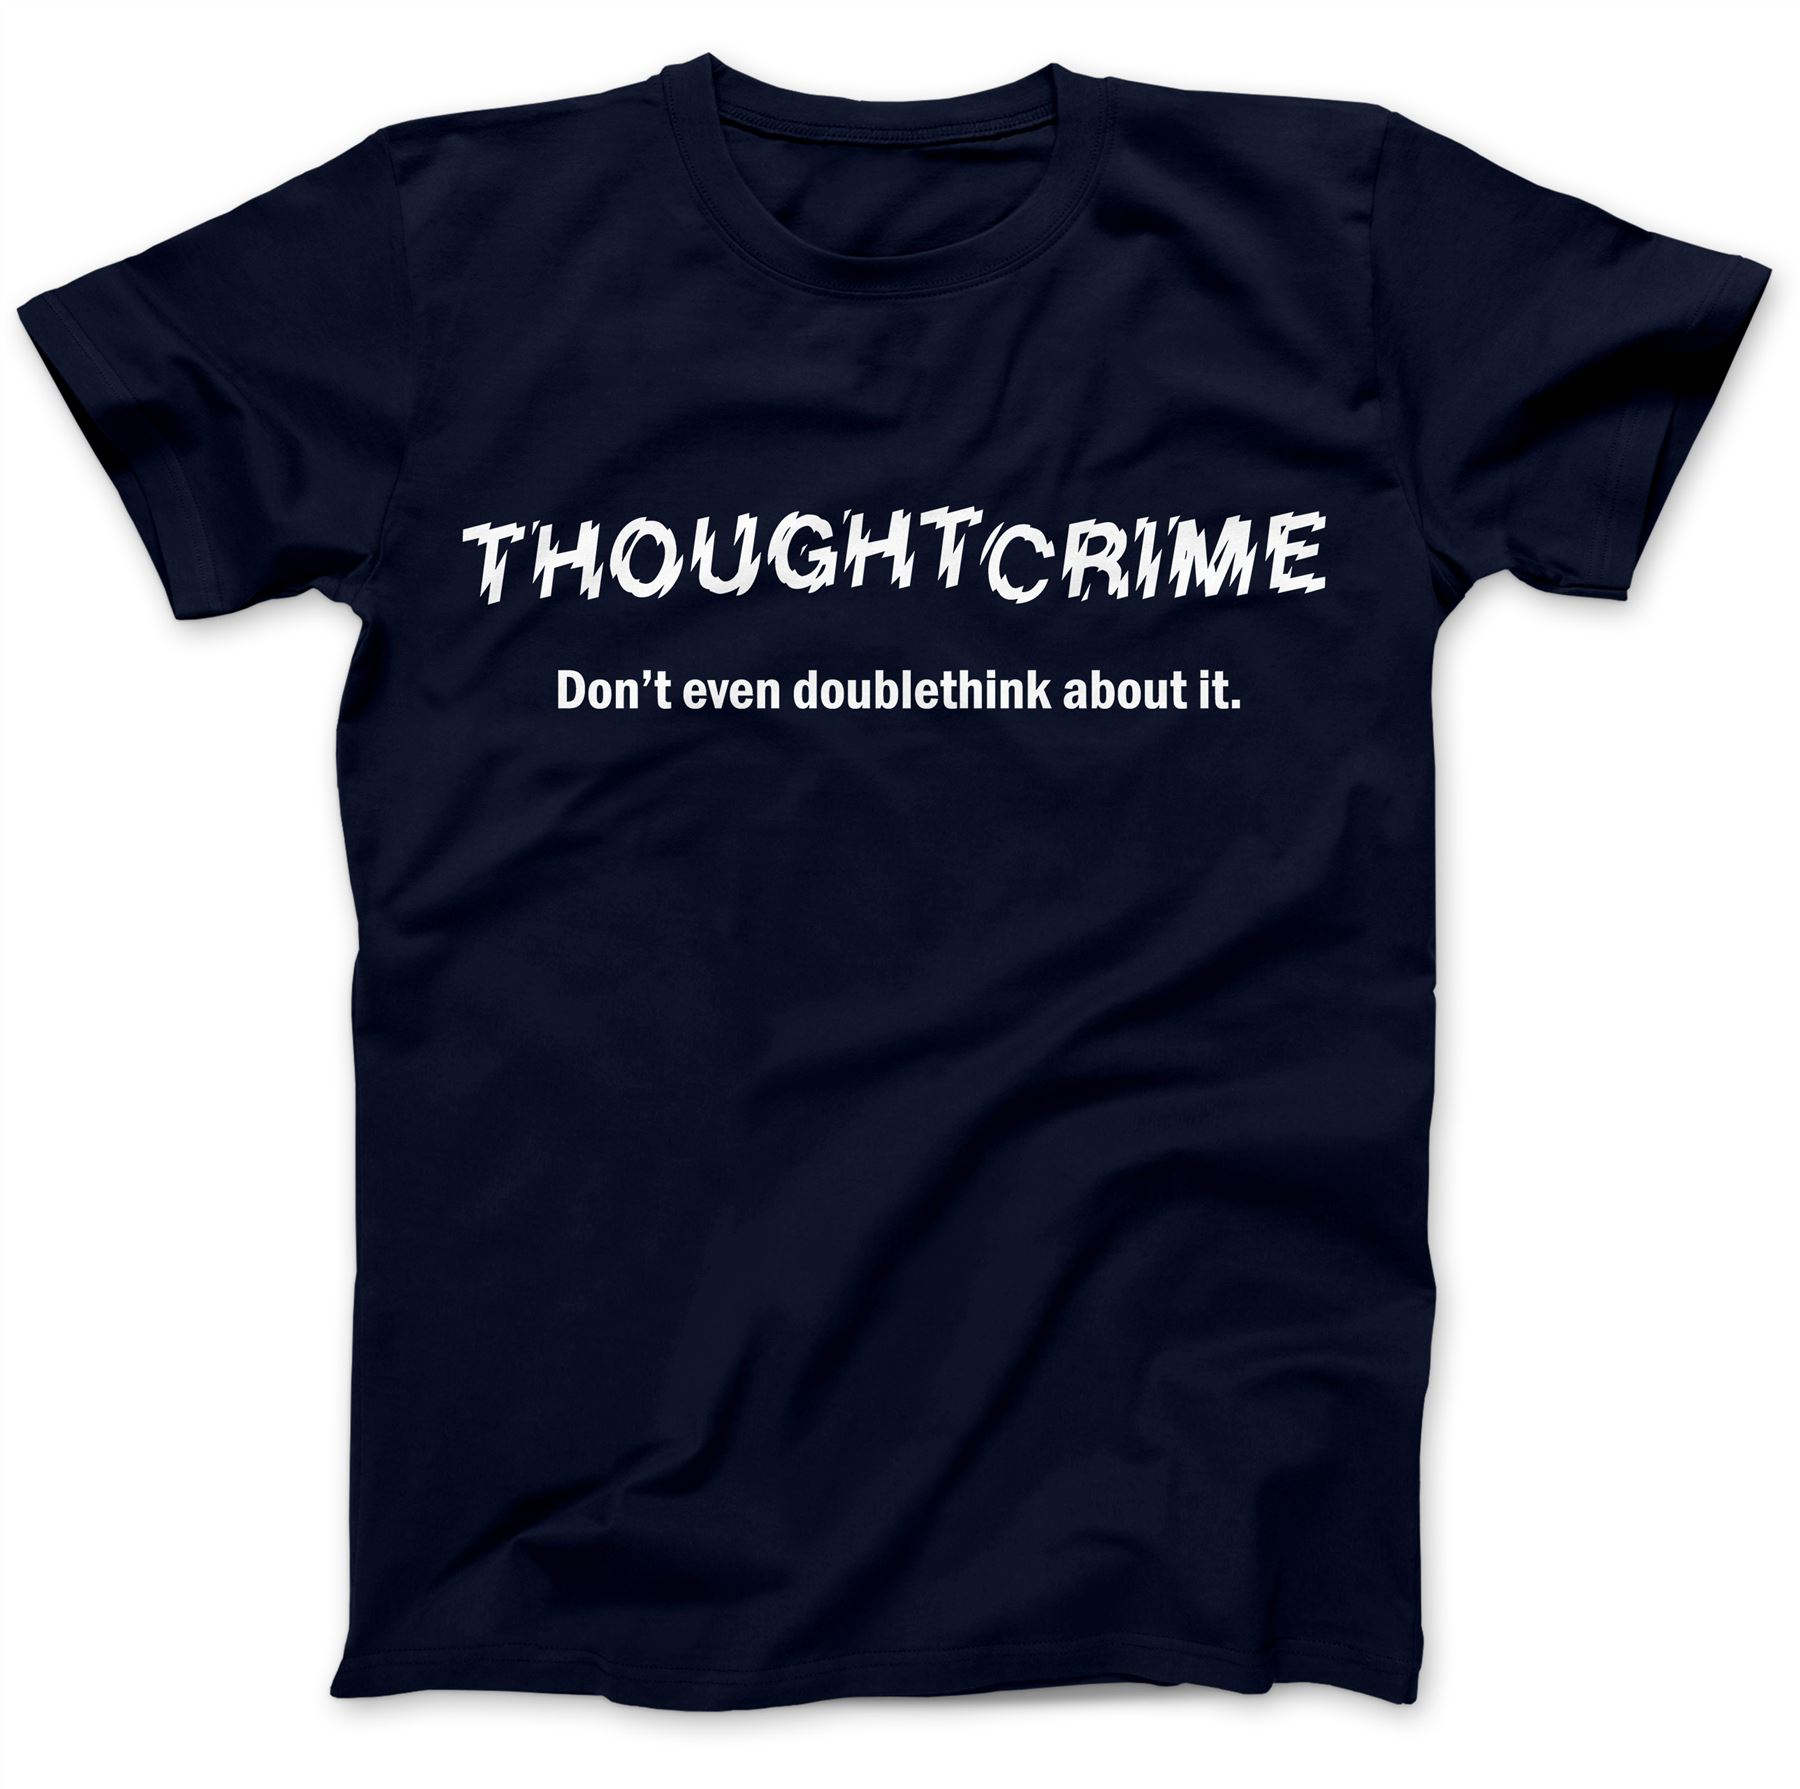 1984-Thought-Crime-George-Orwell-T-Shirt-100-Premium-Cotton-Animal-Farm miniatuur 18